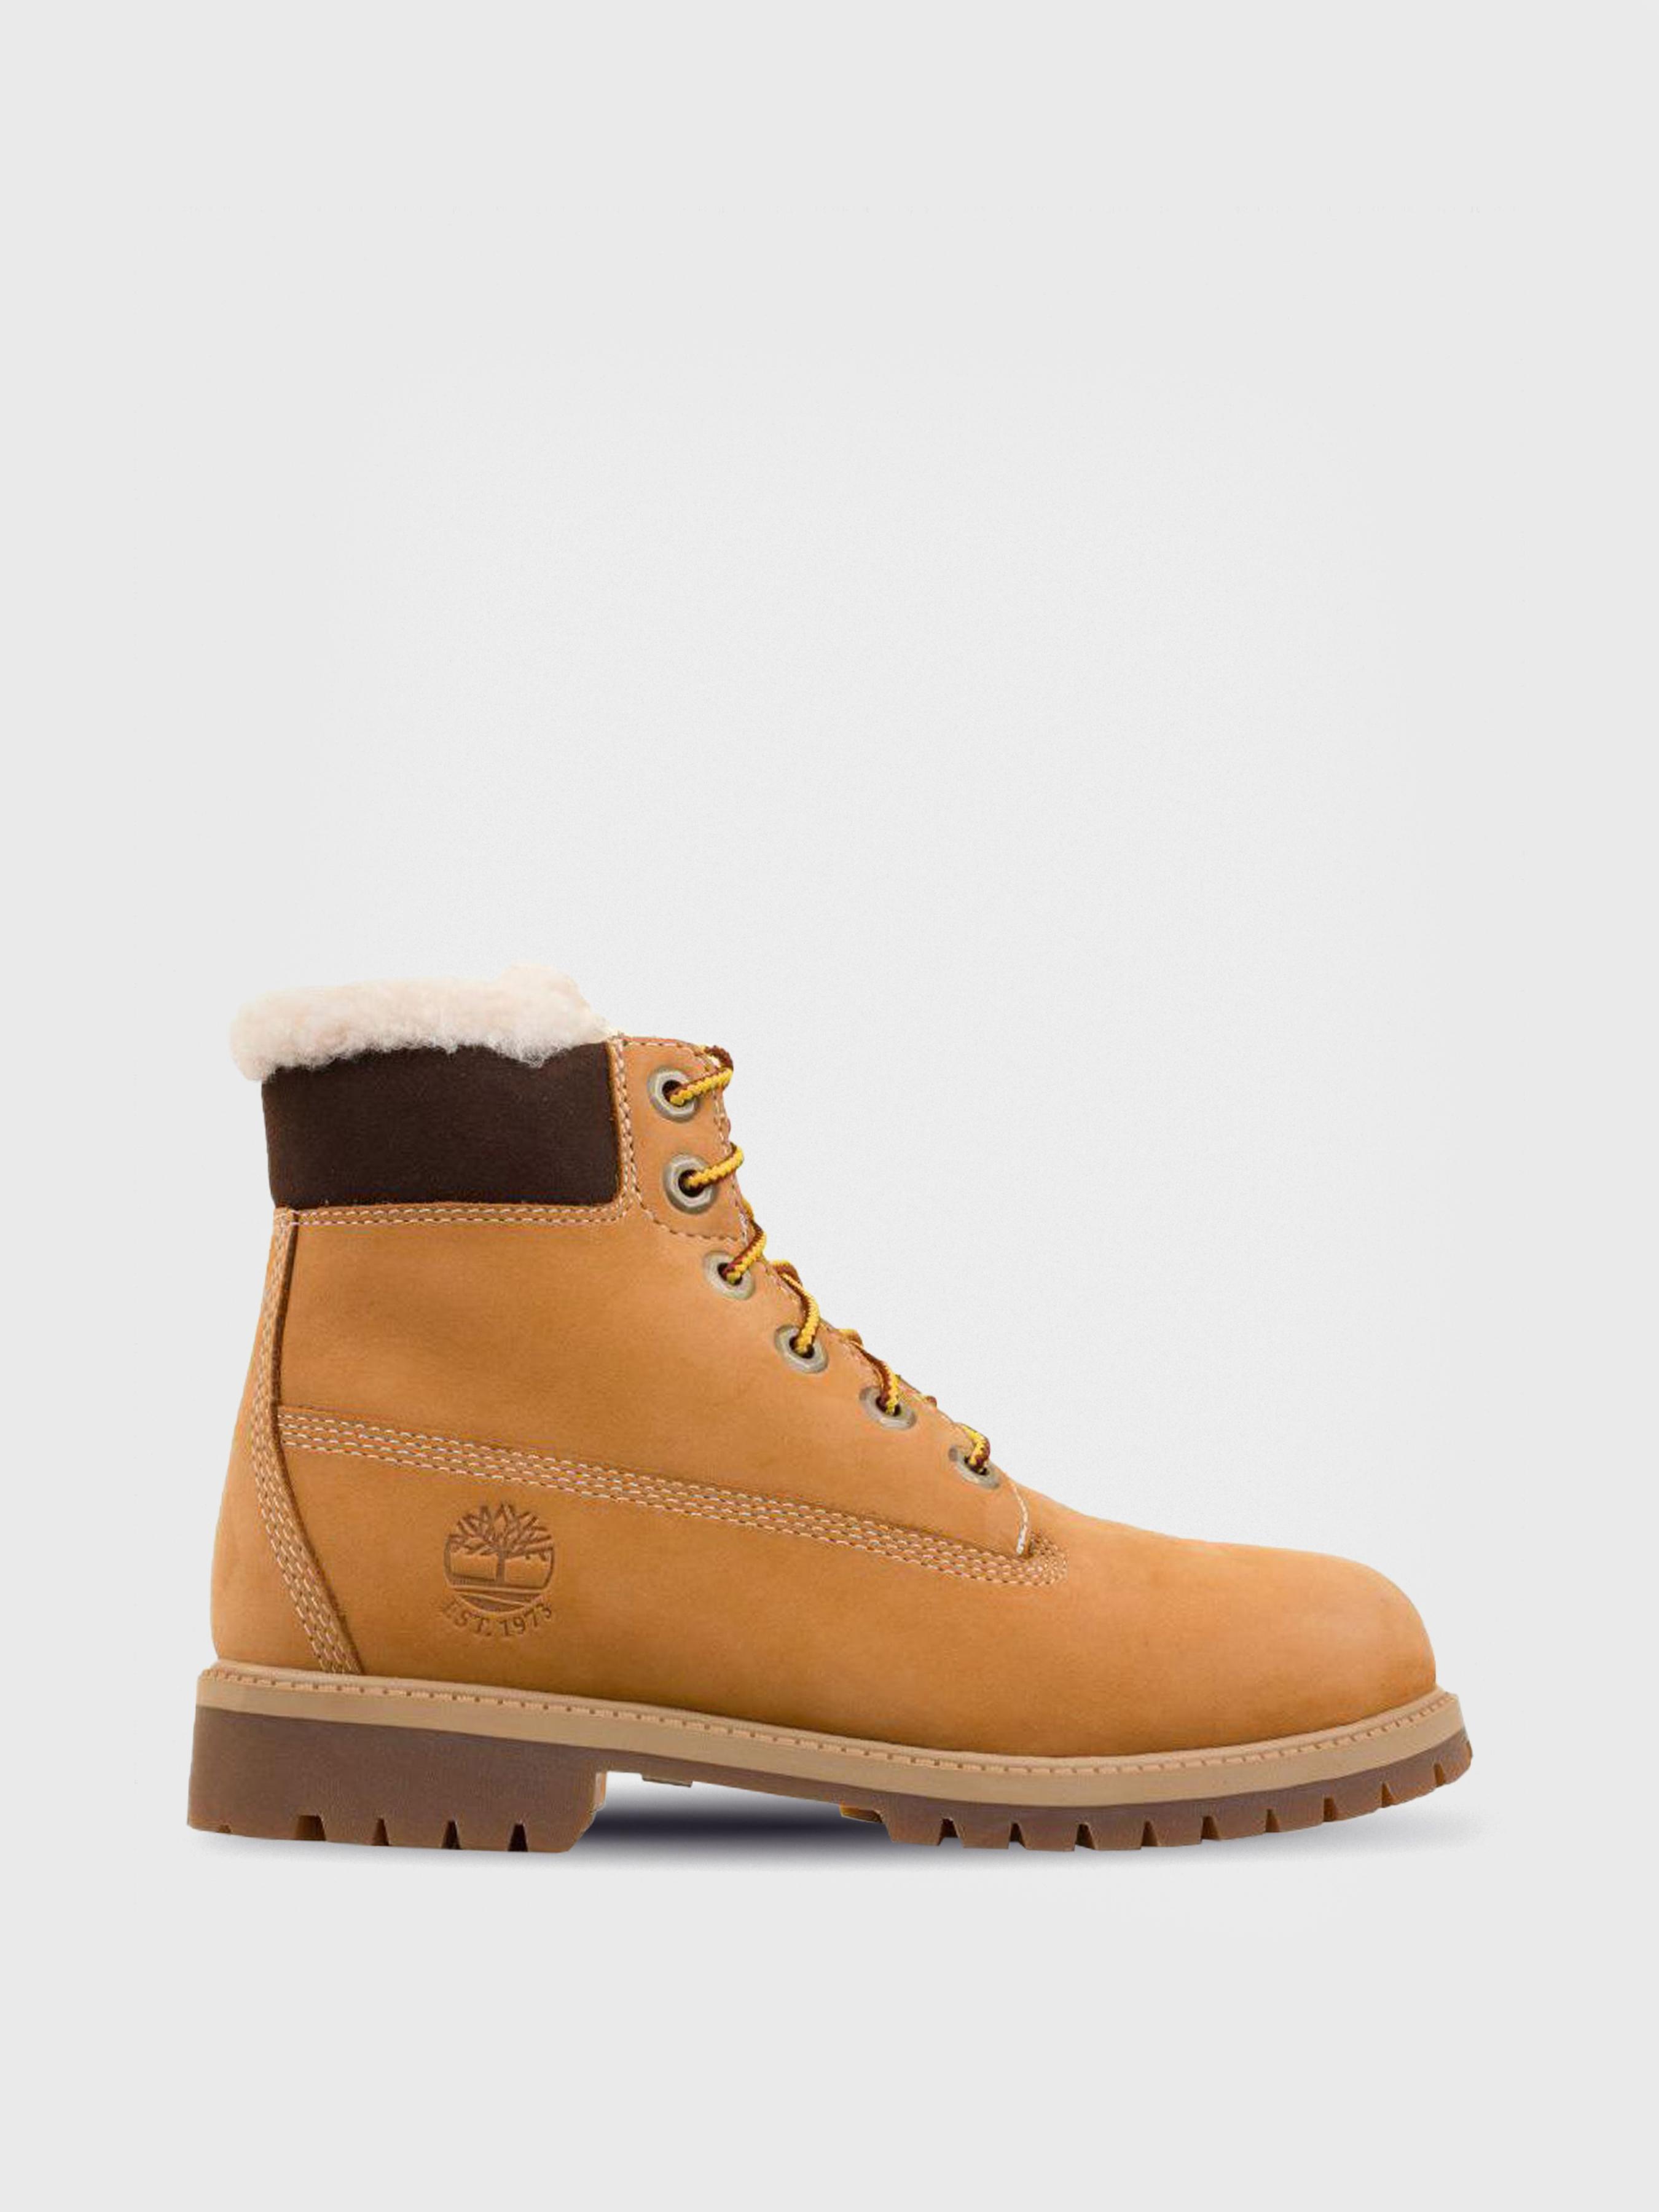 Ботинки для детей Timberland 6 In WPF Warmlined TL1433 цена обуви, 2017